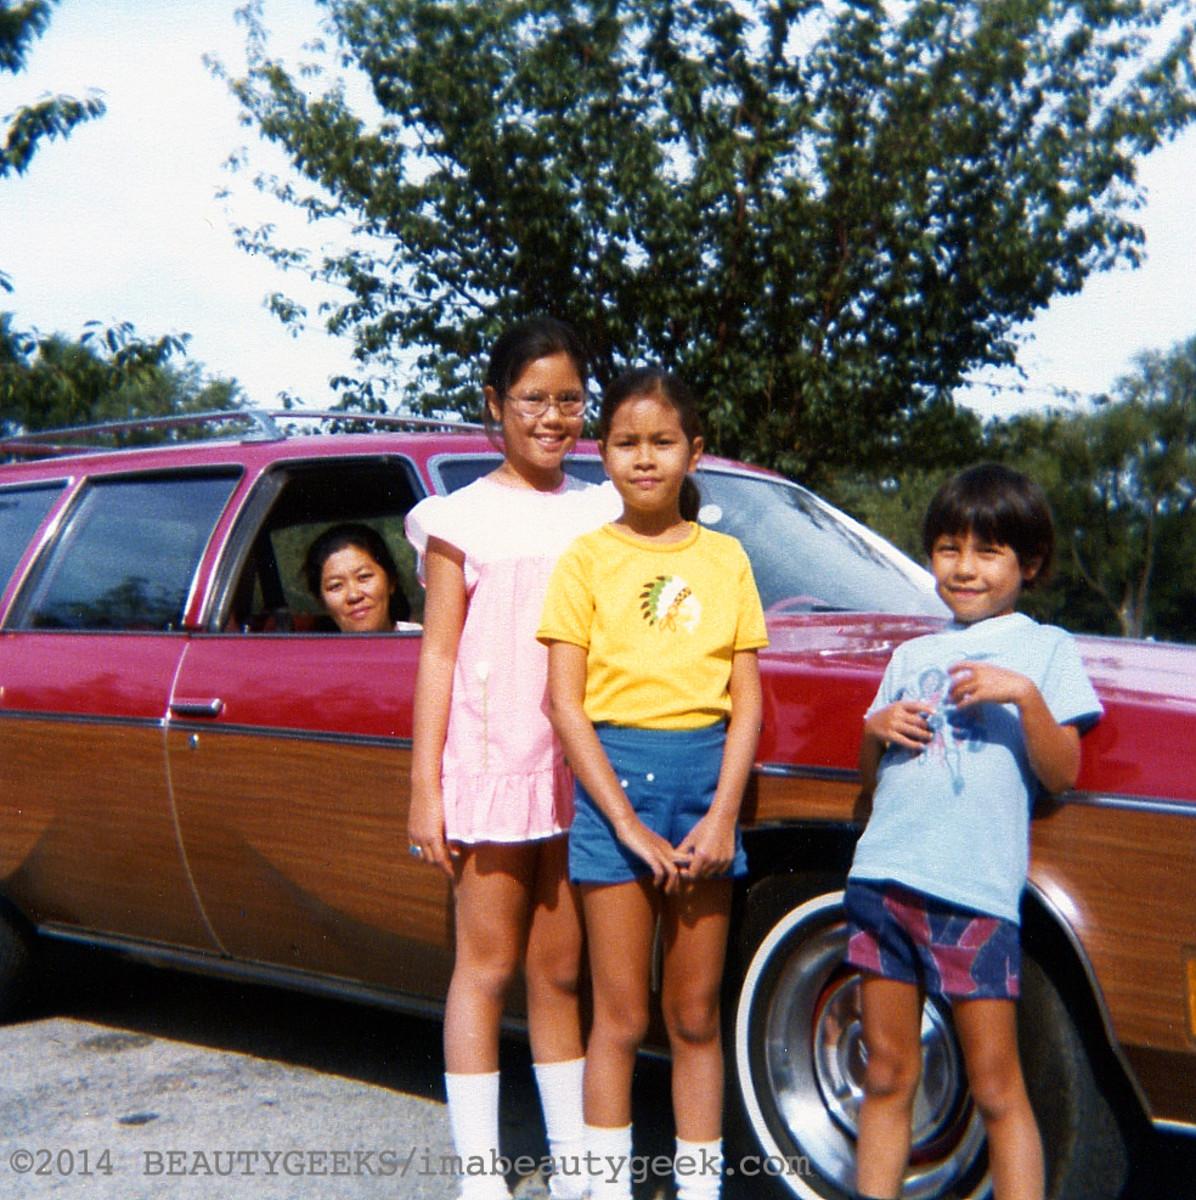 The Falcons_Mum Janine Karen Simon_and a Vista Cruiser